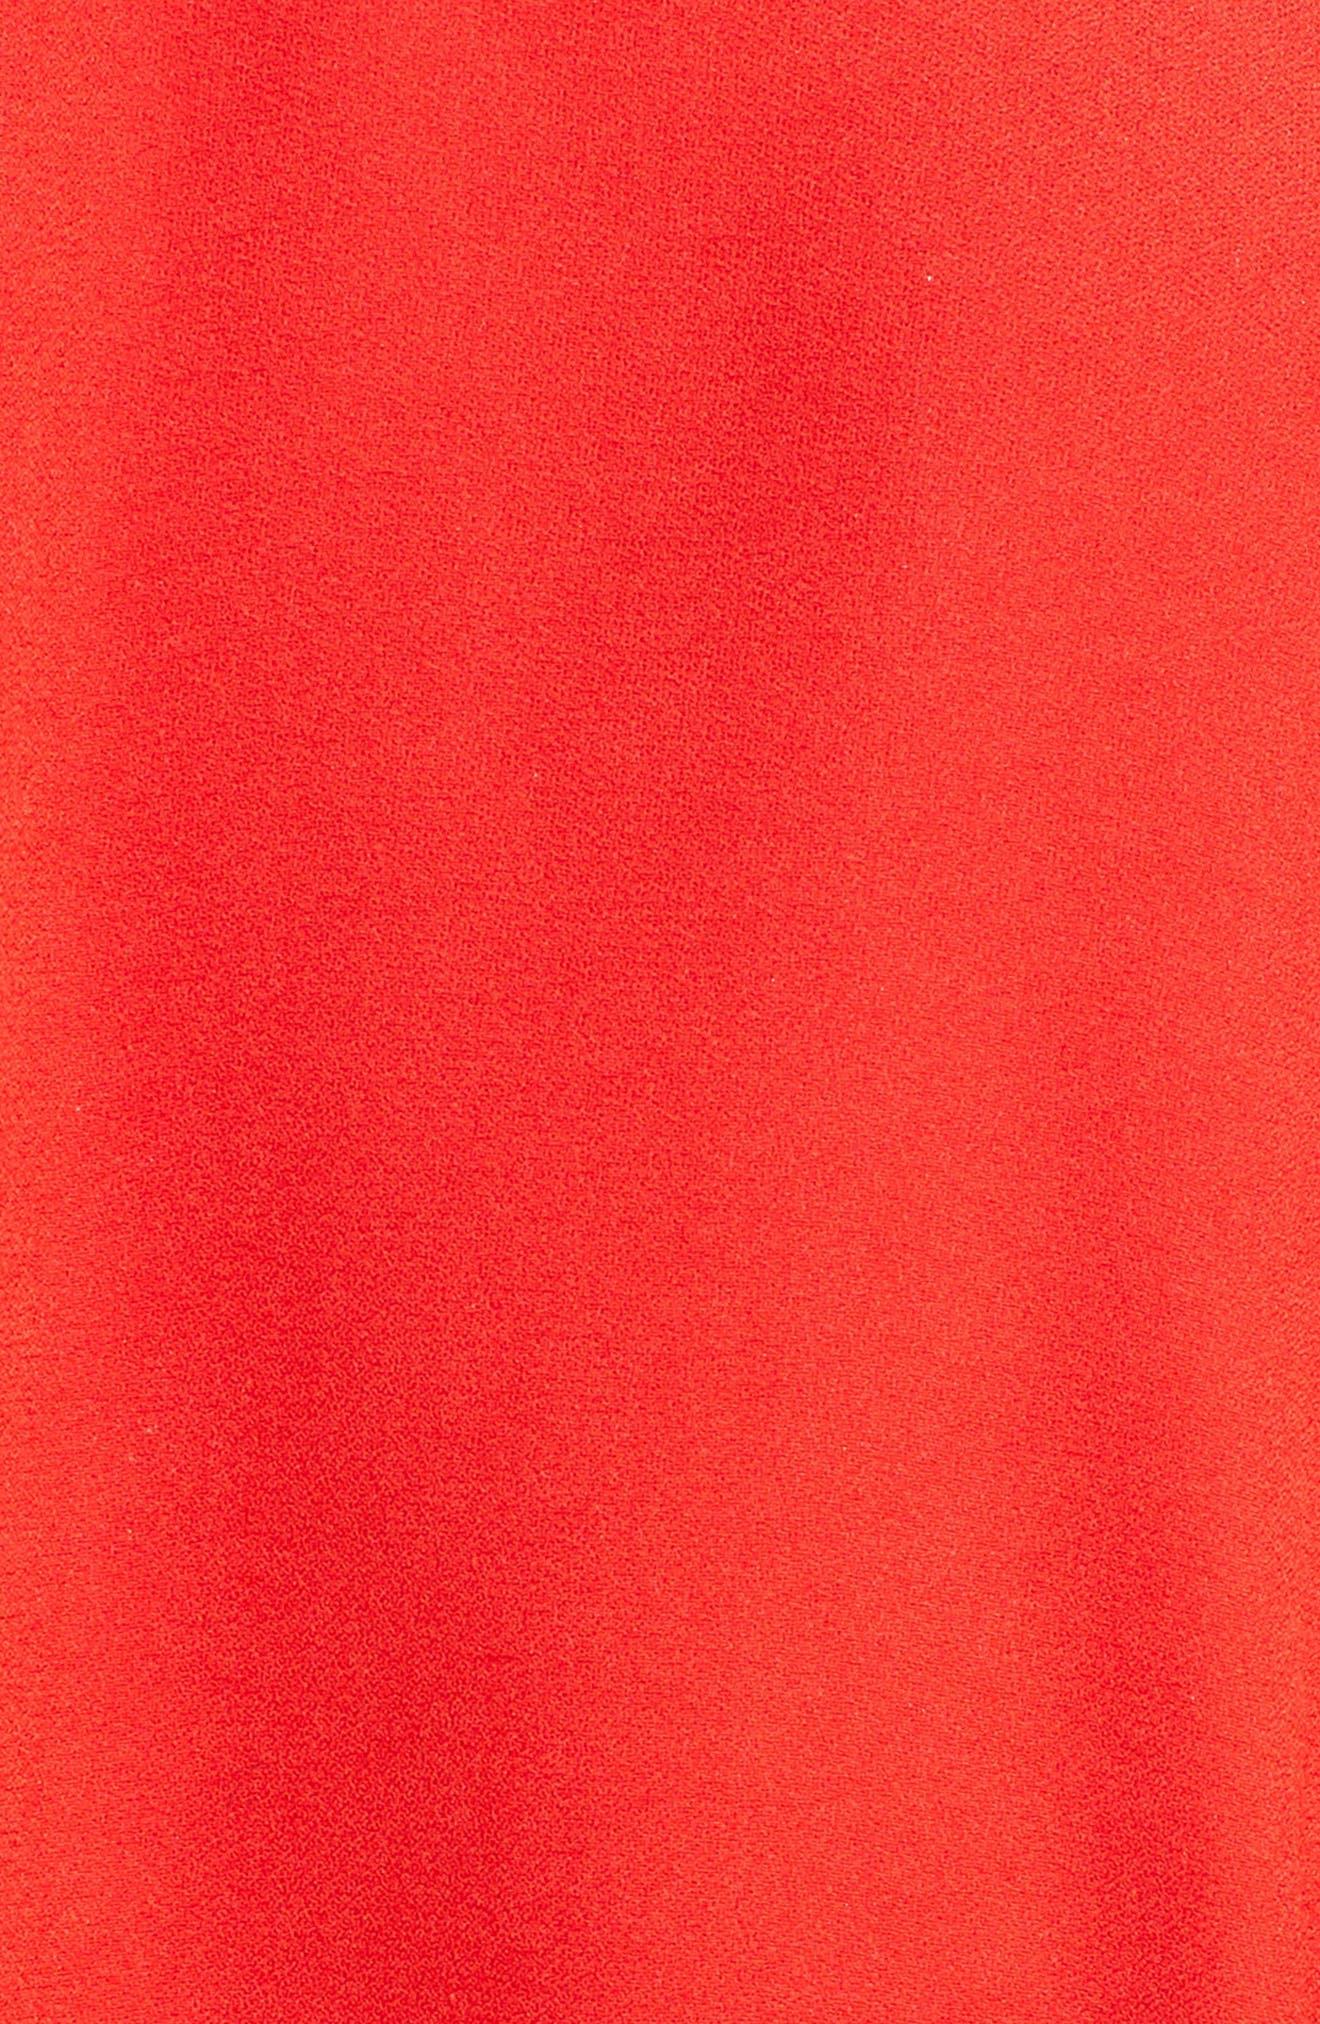 Cape Sleeve Satin Crepe Gown,                             Alternate thumbnail 5, color,                             624